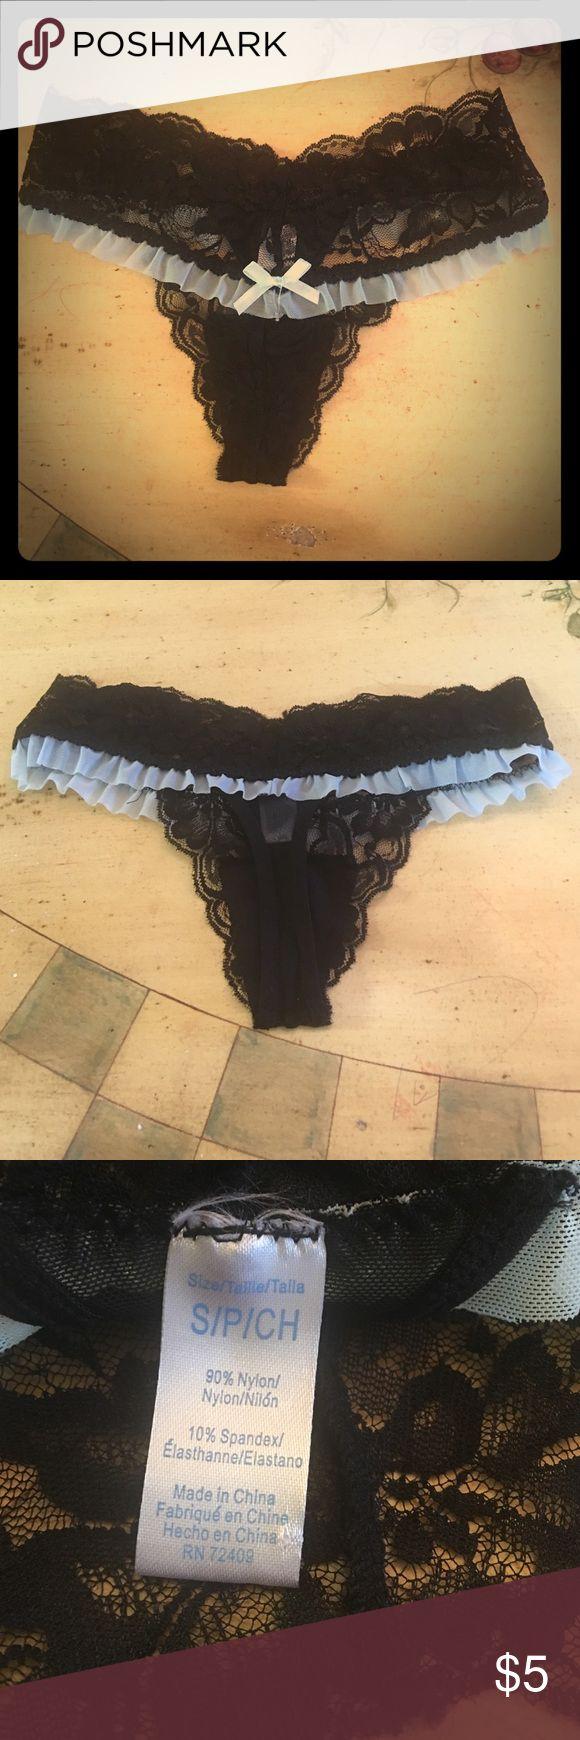 Best 25+ Buy lingerie ideas on Pinterest | Beautiful lingerie ...